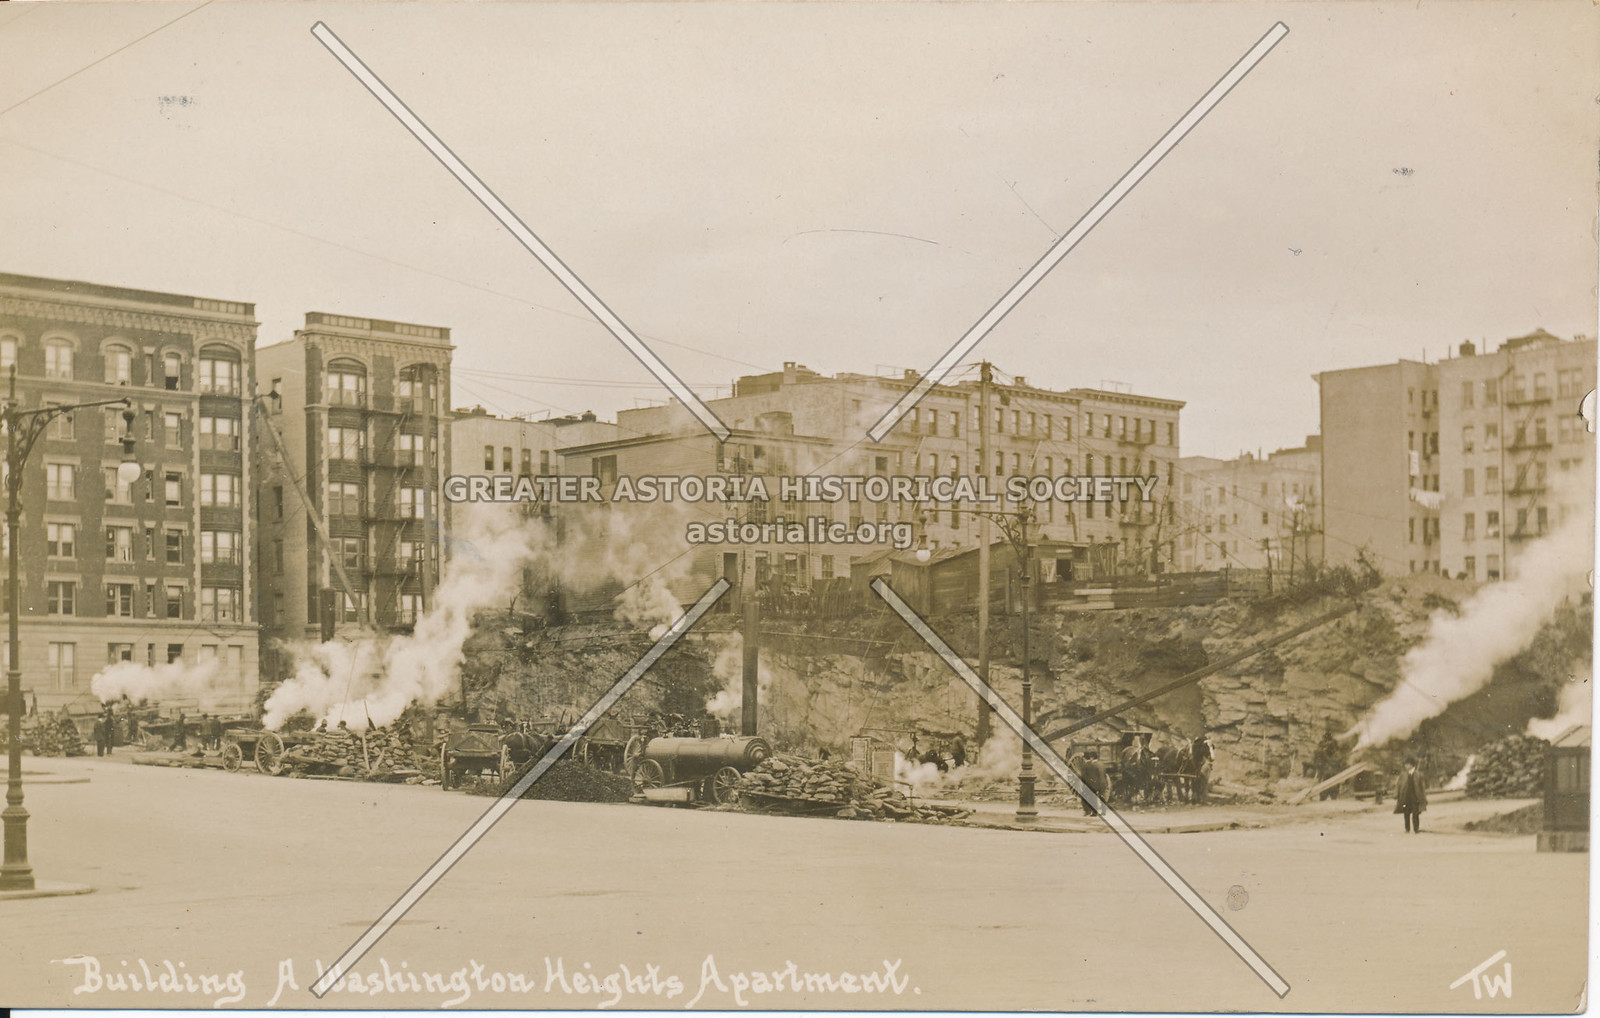 Building a Washington Heights Apartment, N.Y.